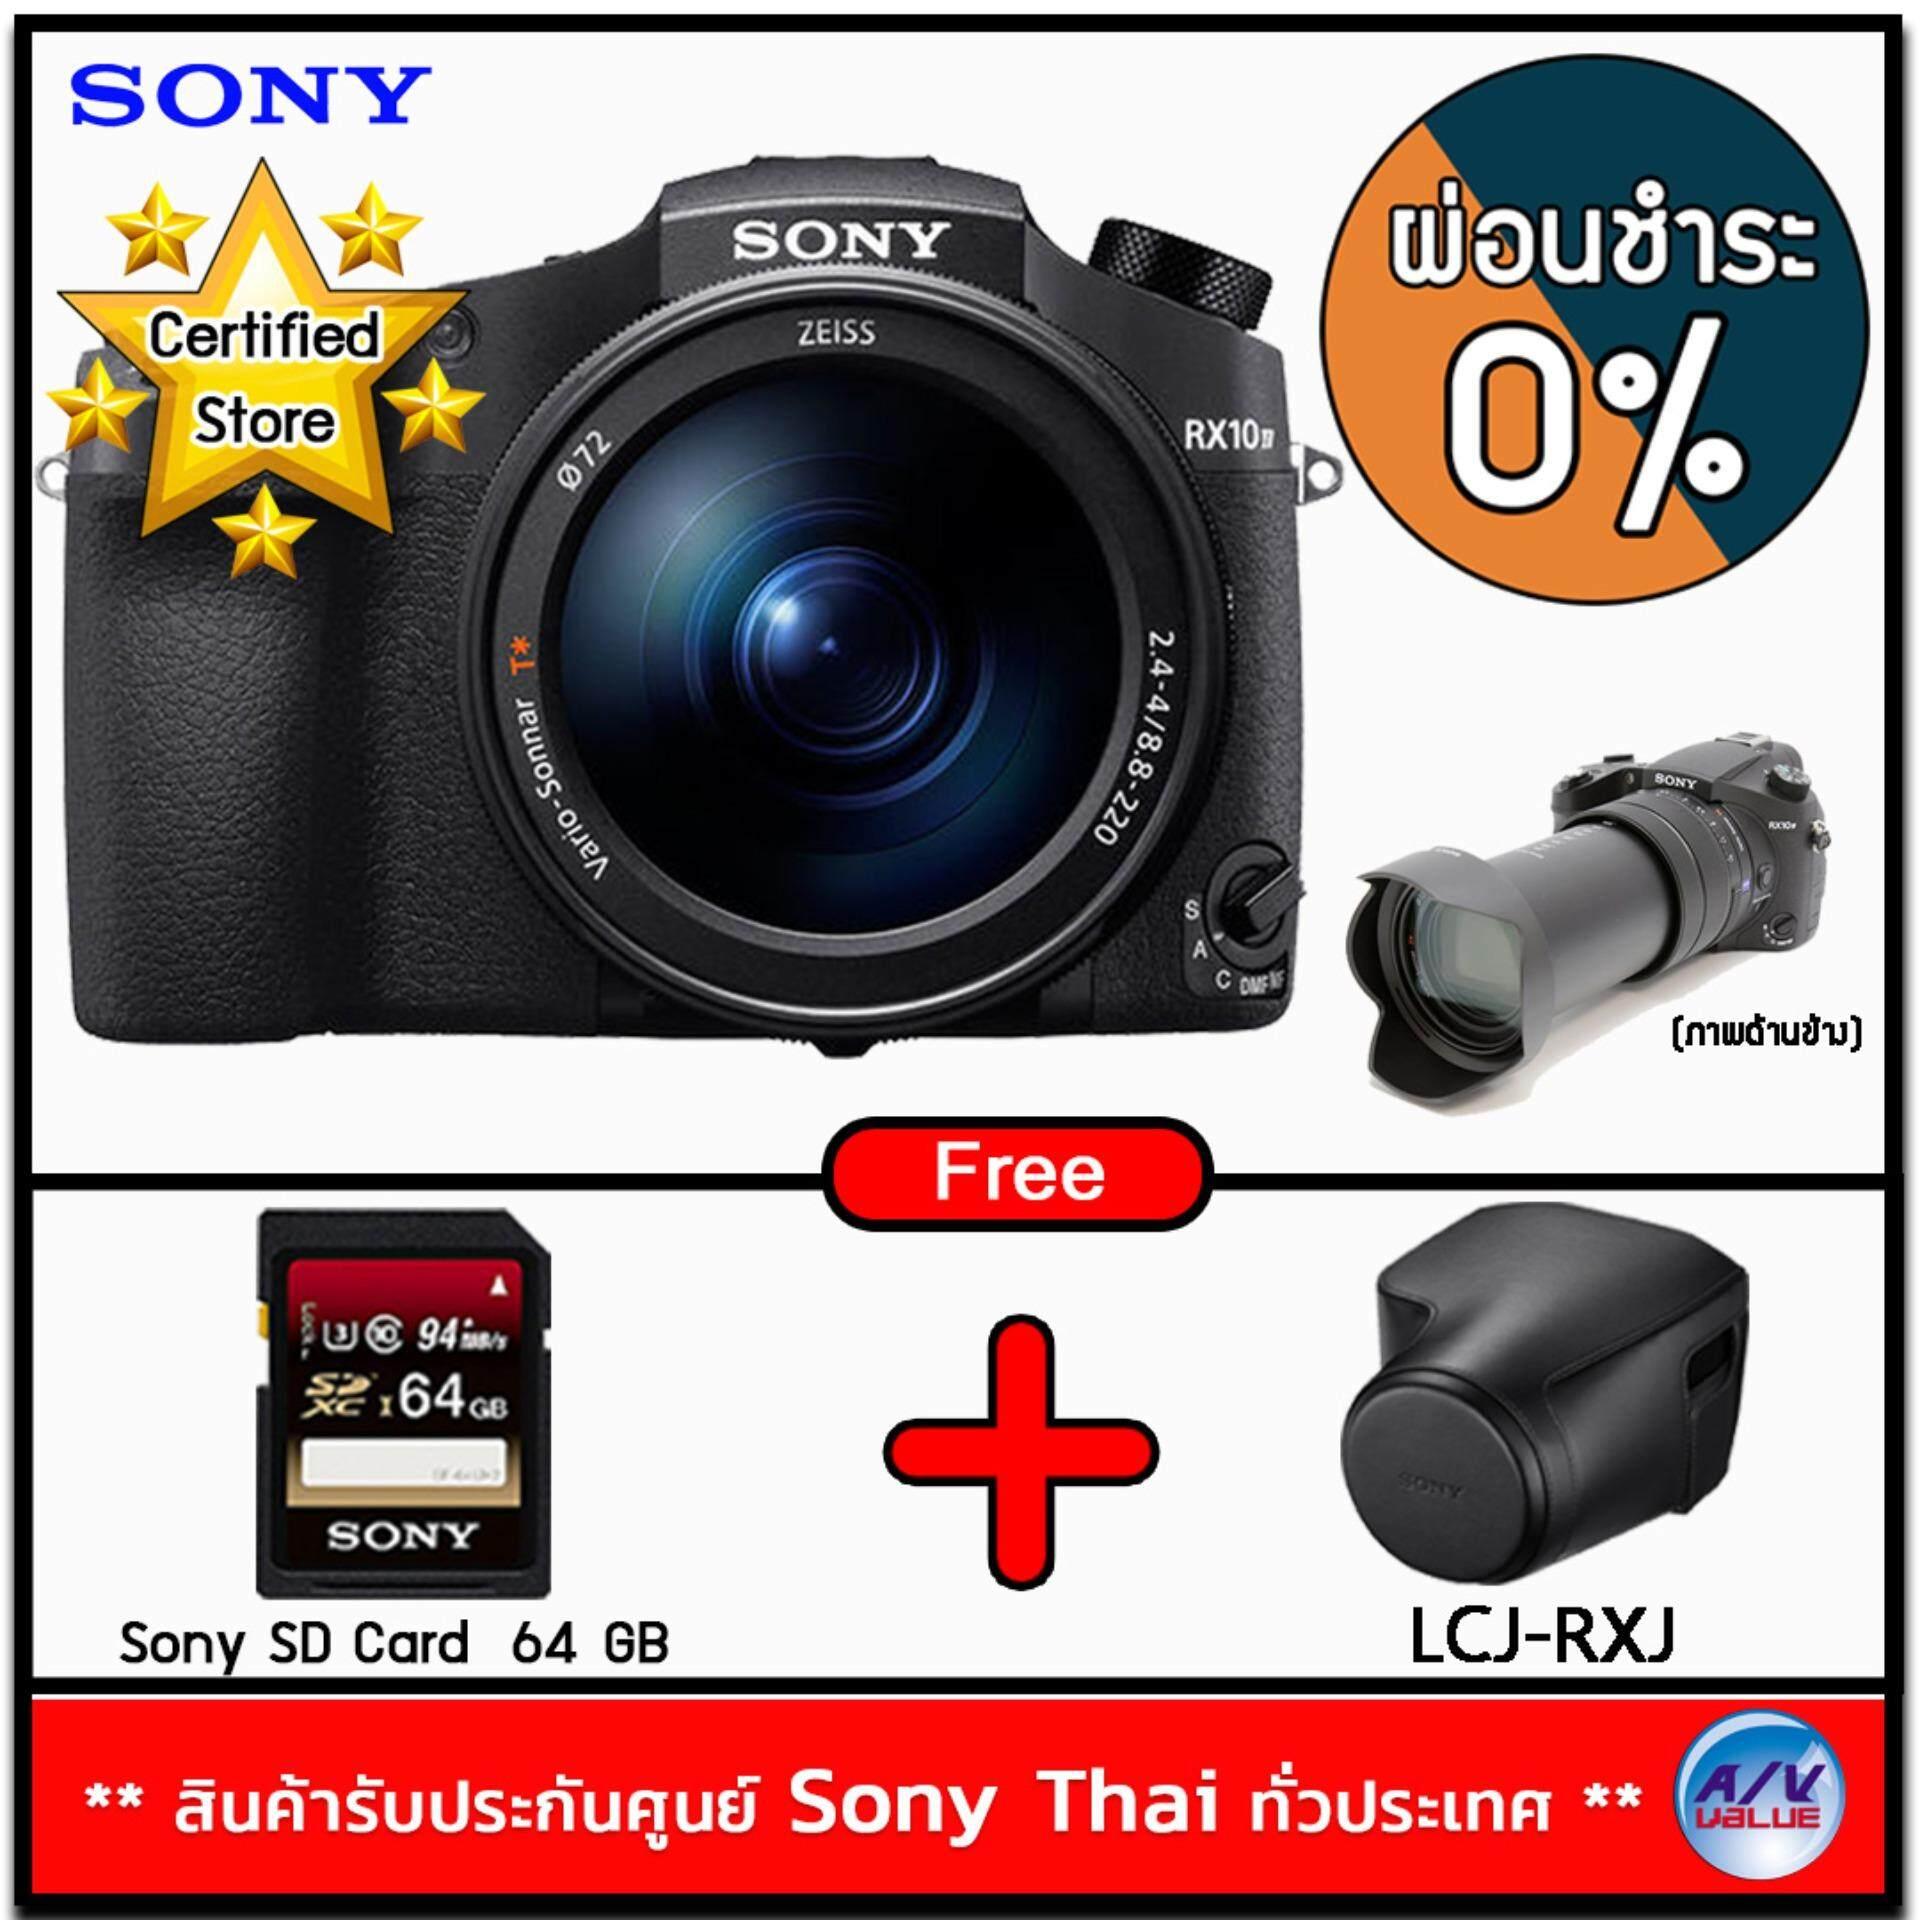 Sony Cyber-shot Pro รุ่น DSC-RX10M4 + Sony SD Card 64GB + เคสหนังแท้ Sony  LCJ-RXJ **รับประกันศูนย์ Sony ทั่วประเทศ